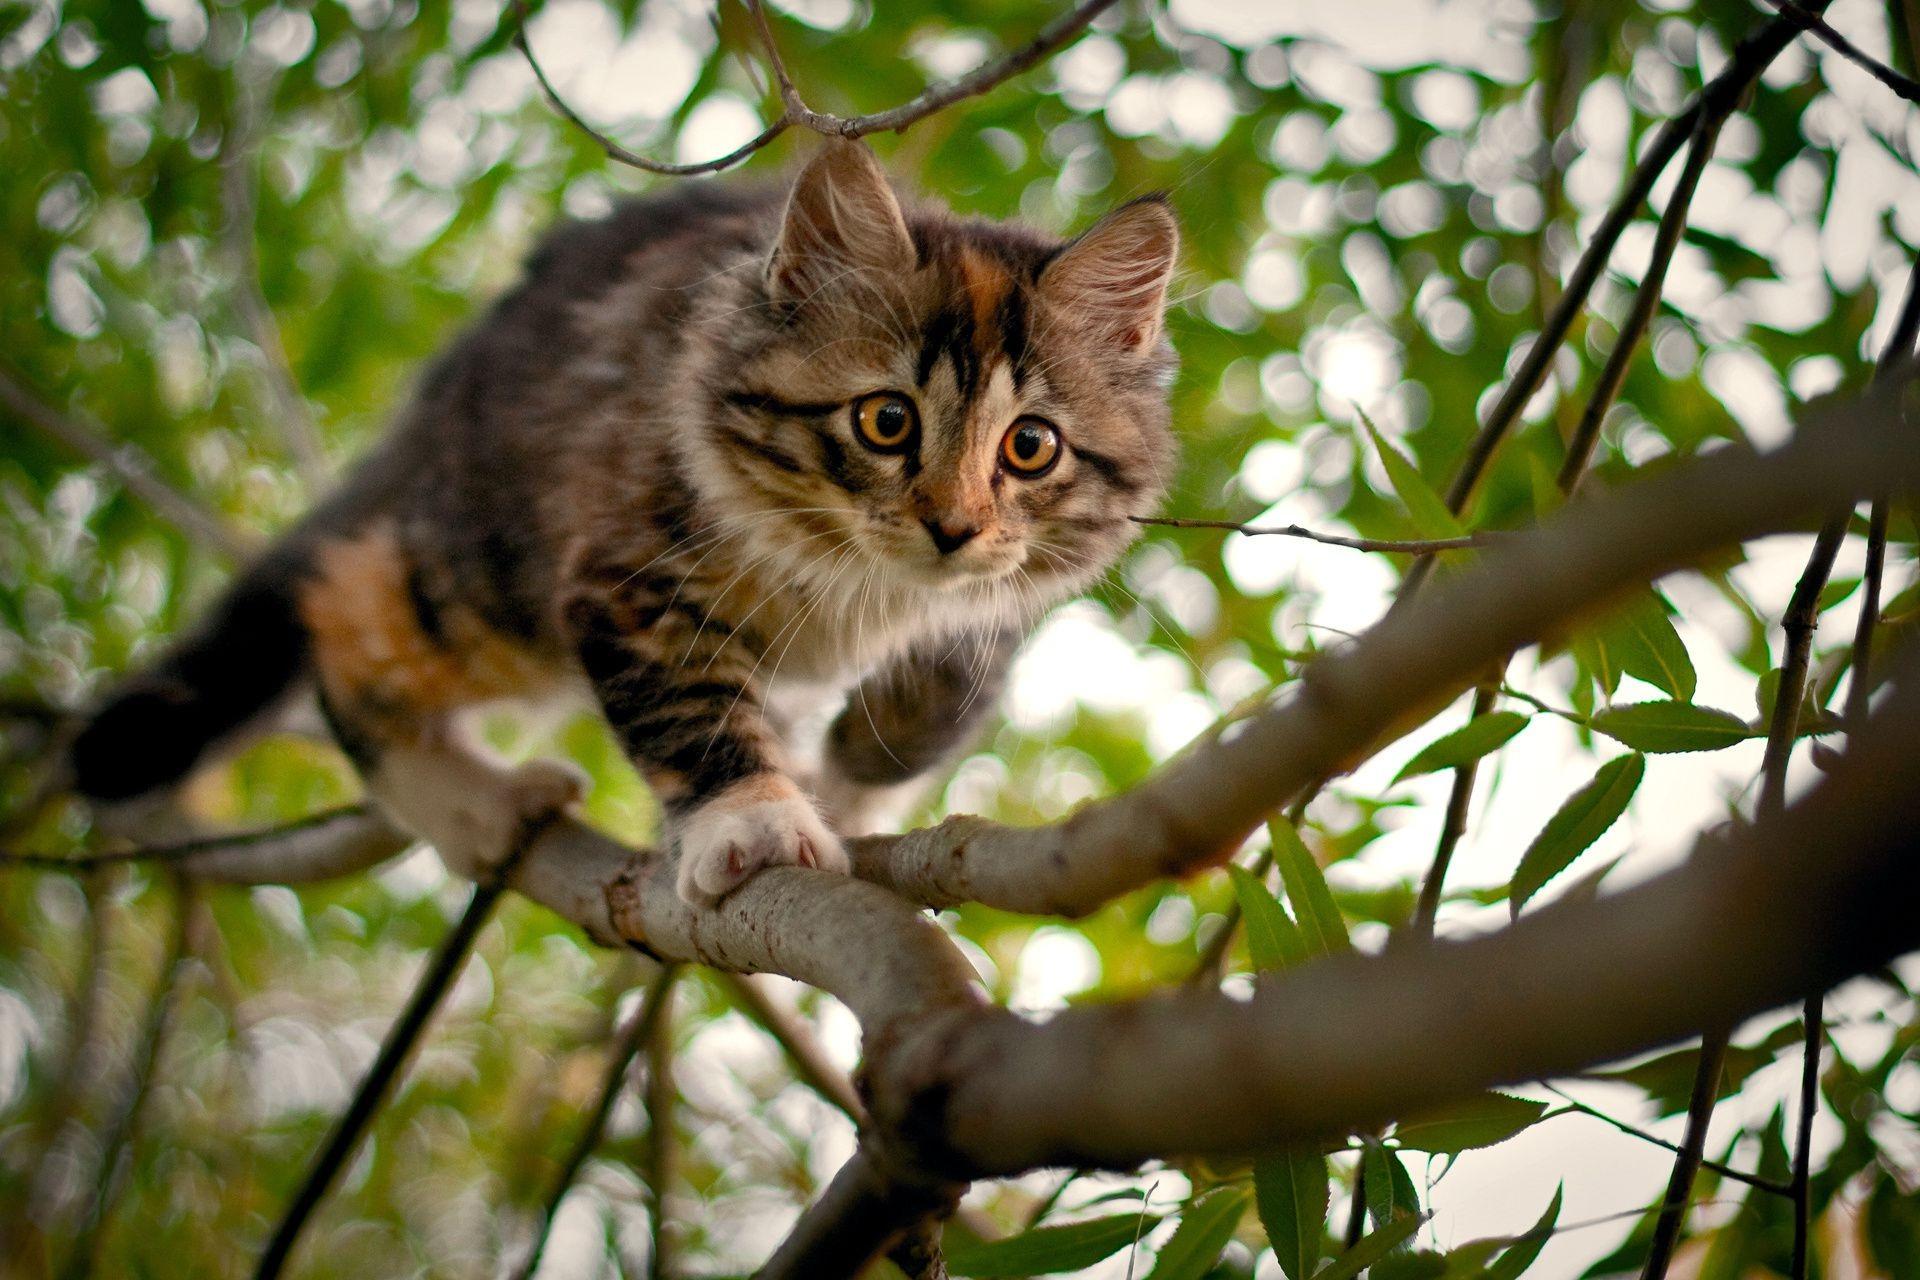 кот животное природа  № 2038120 бесплатно